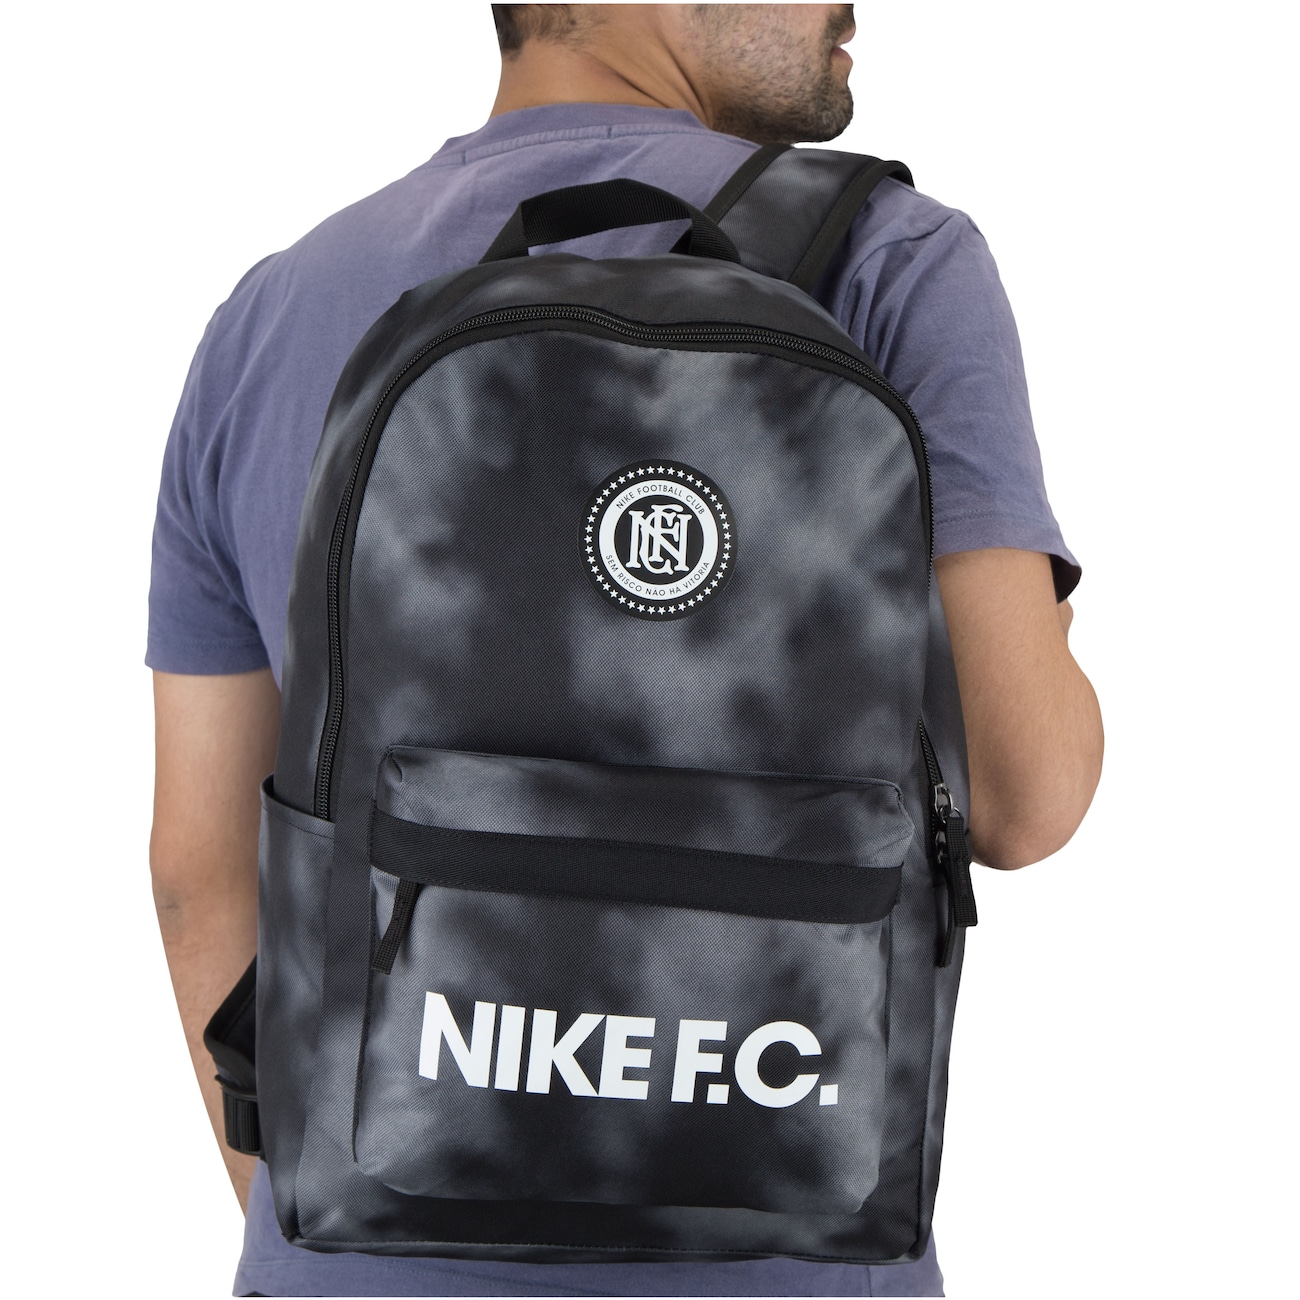 posponer Eh más  Mochila Nike F.C. - 25 Litros - Centauro